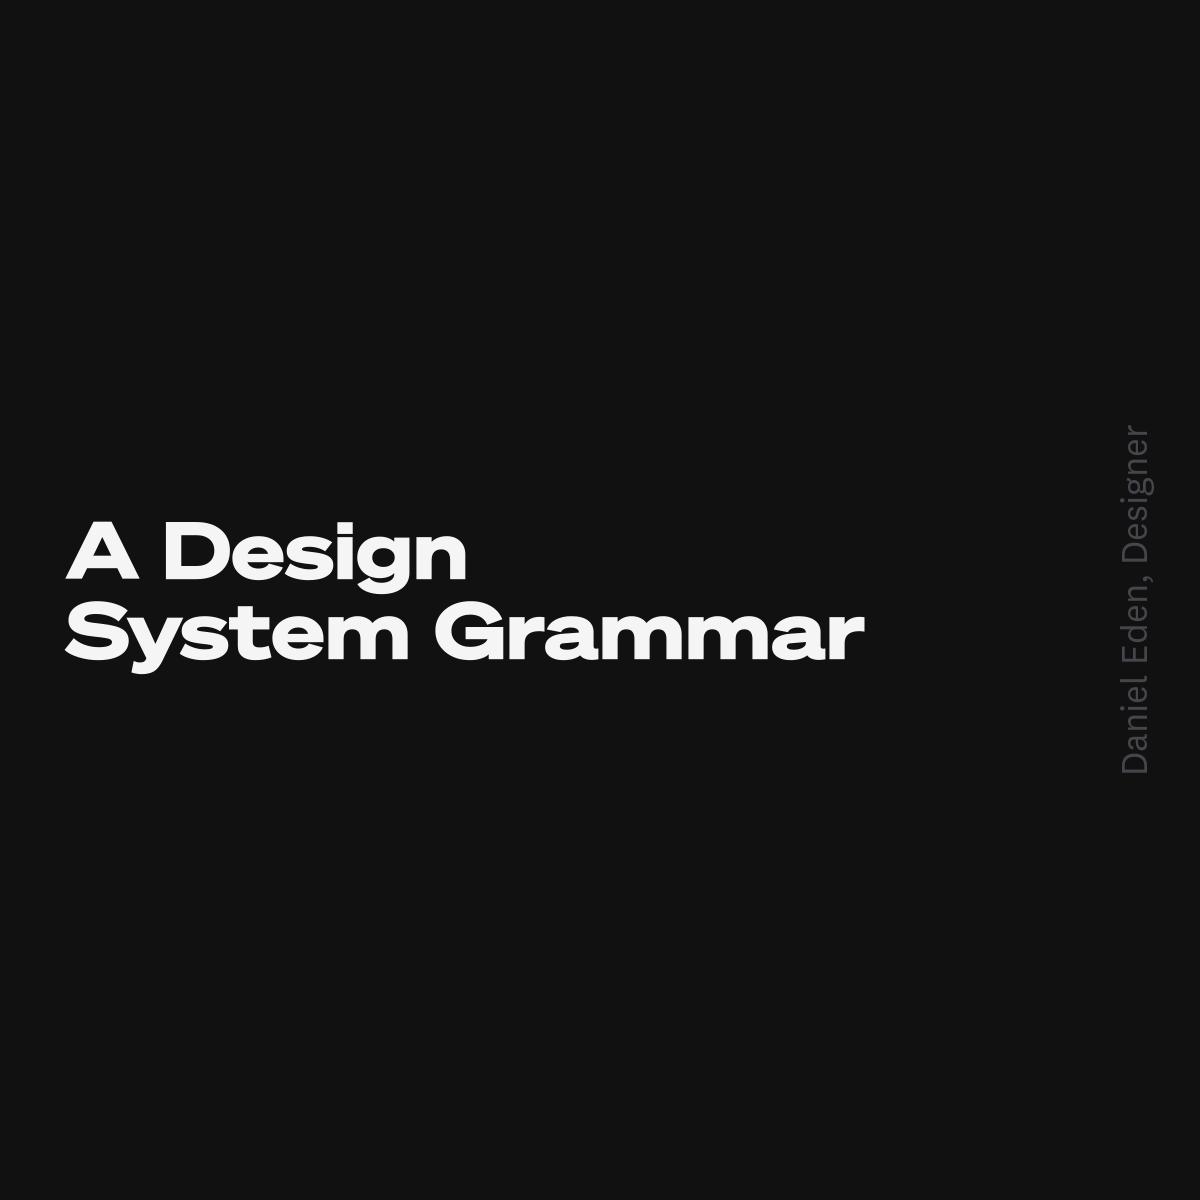 A Design System Grammar | Daniel T. Eden, Designer